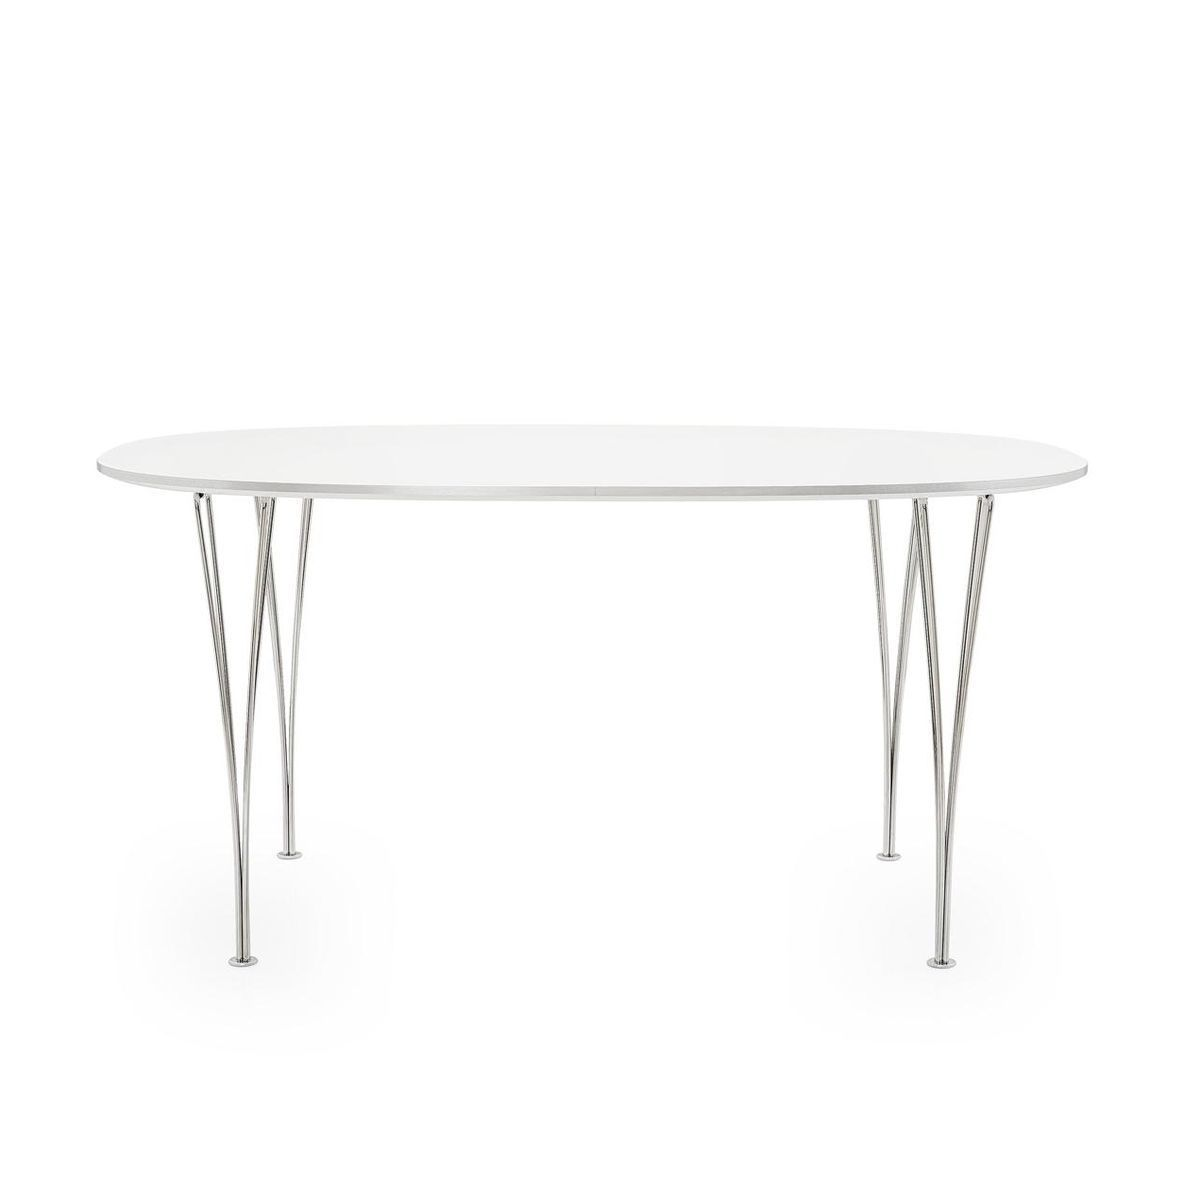 b612 super elliptic table 150cm fritz hansen. Black Bedroom Furniture Sets. Home Design Ideas